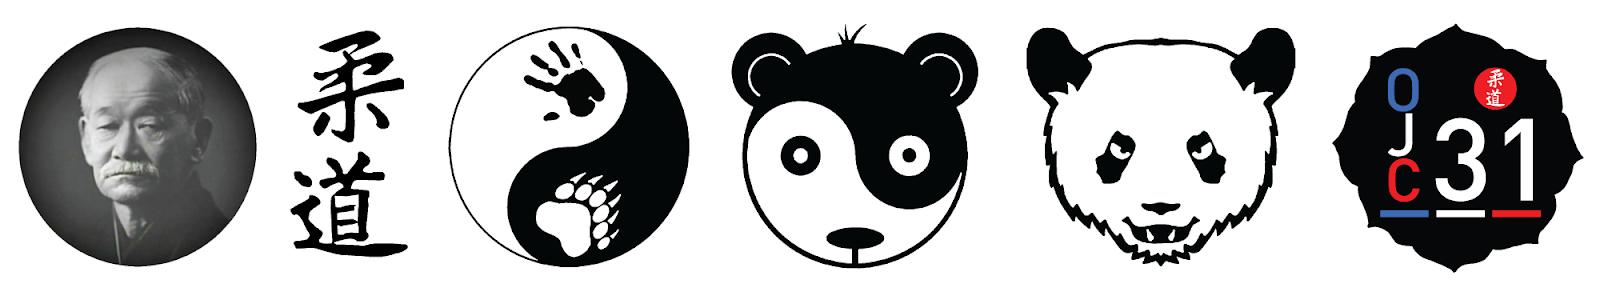 bandeau_2HD_logos_OJC31.png